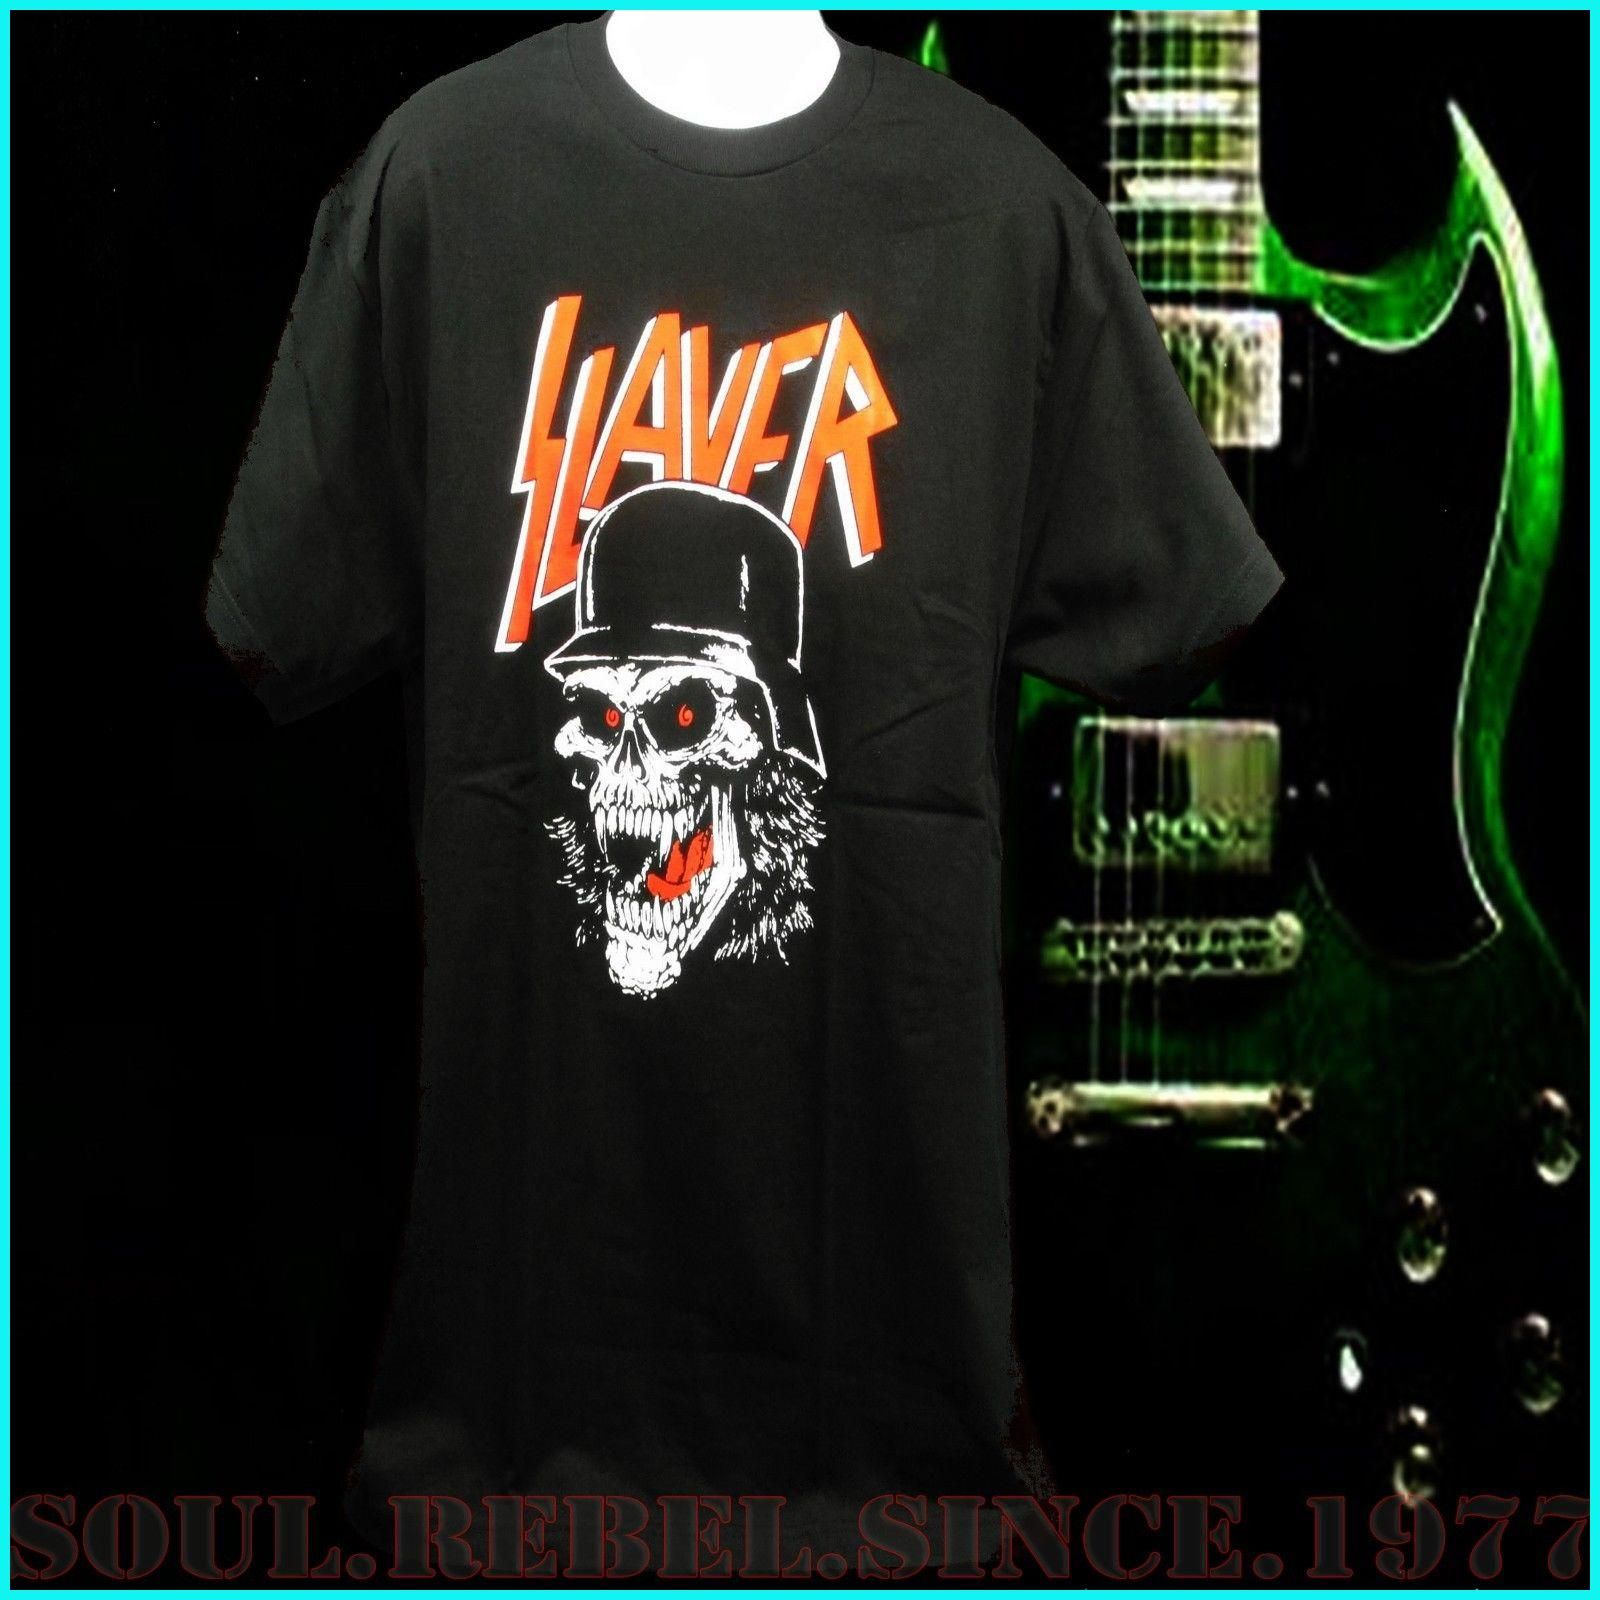 FL&AEVVE SLAYER Punk Rock Band T SHIRT men's sizes comprar camisetas de futbol baratas por ...